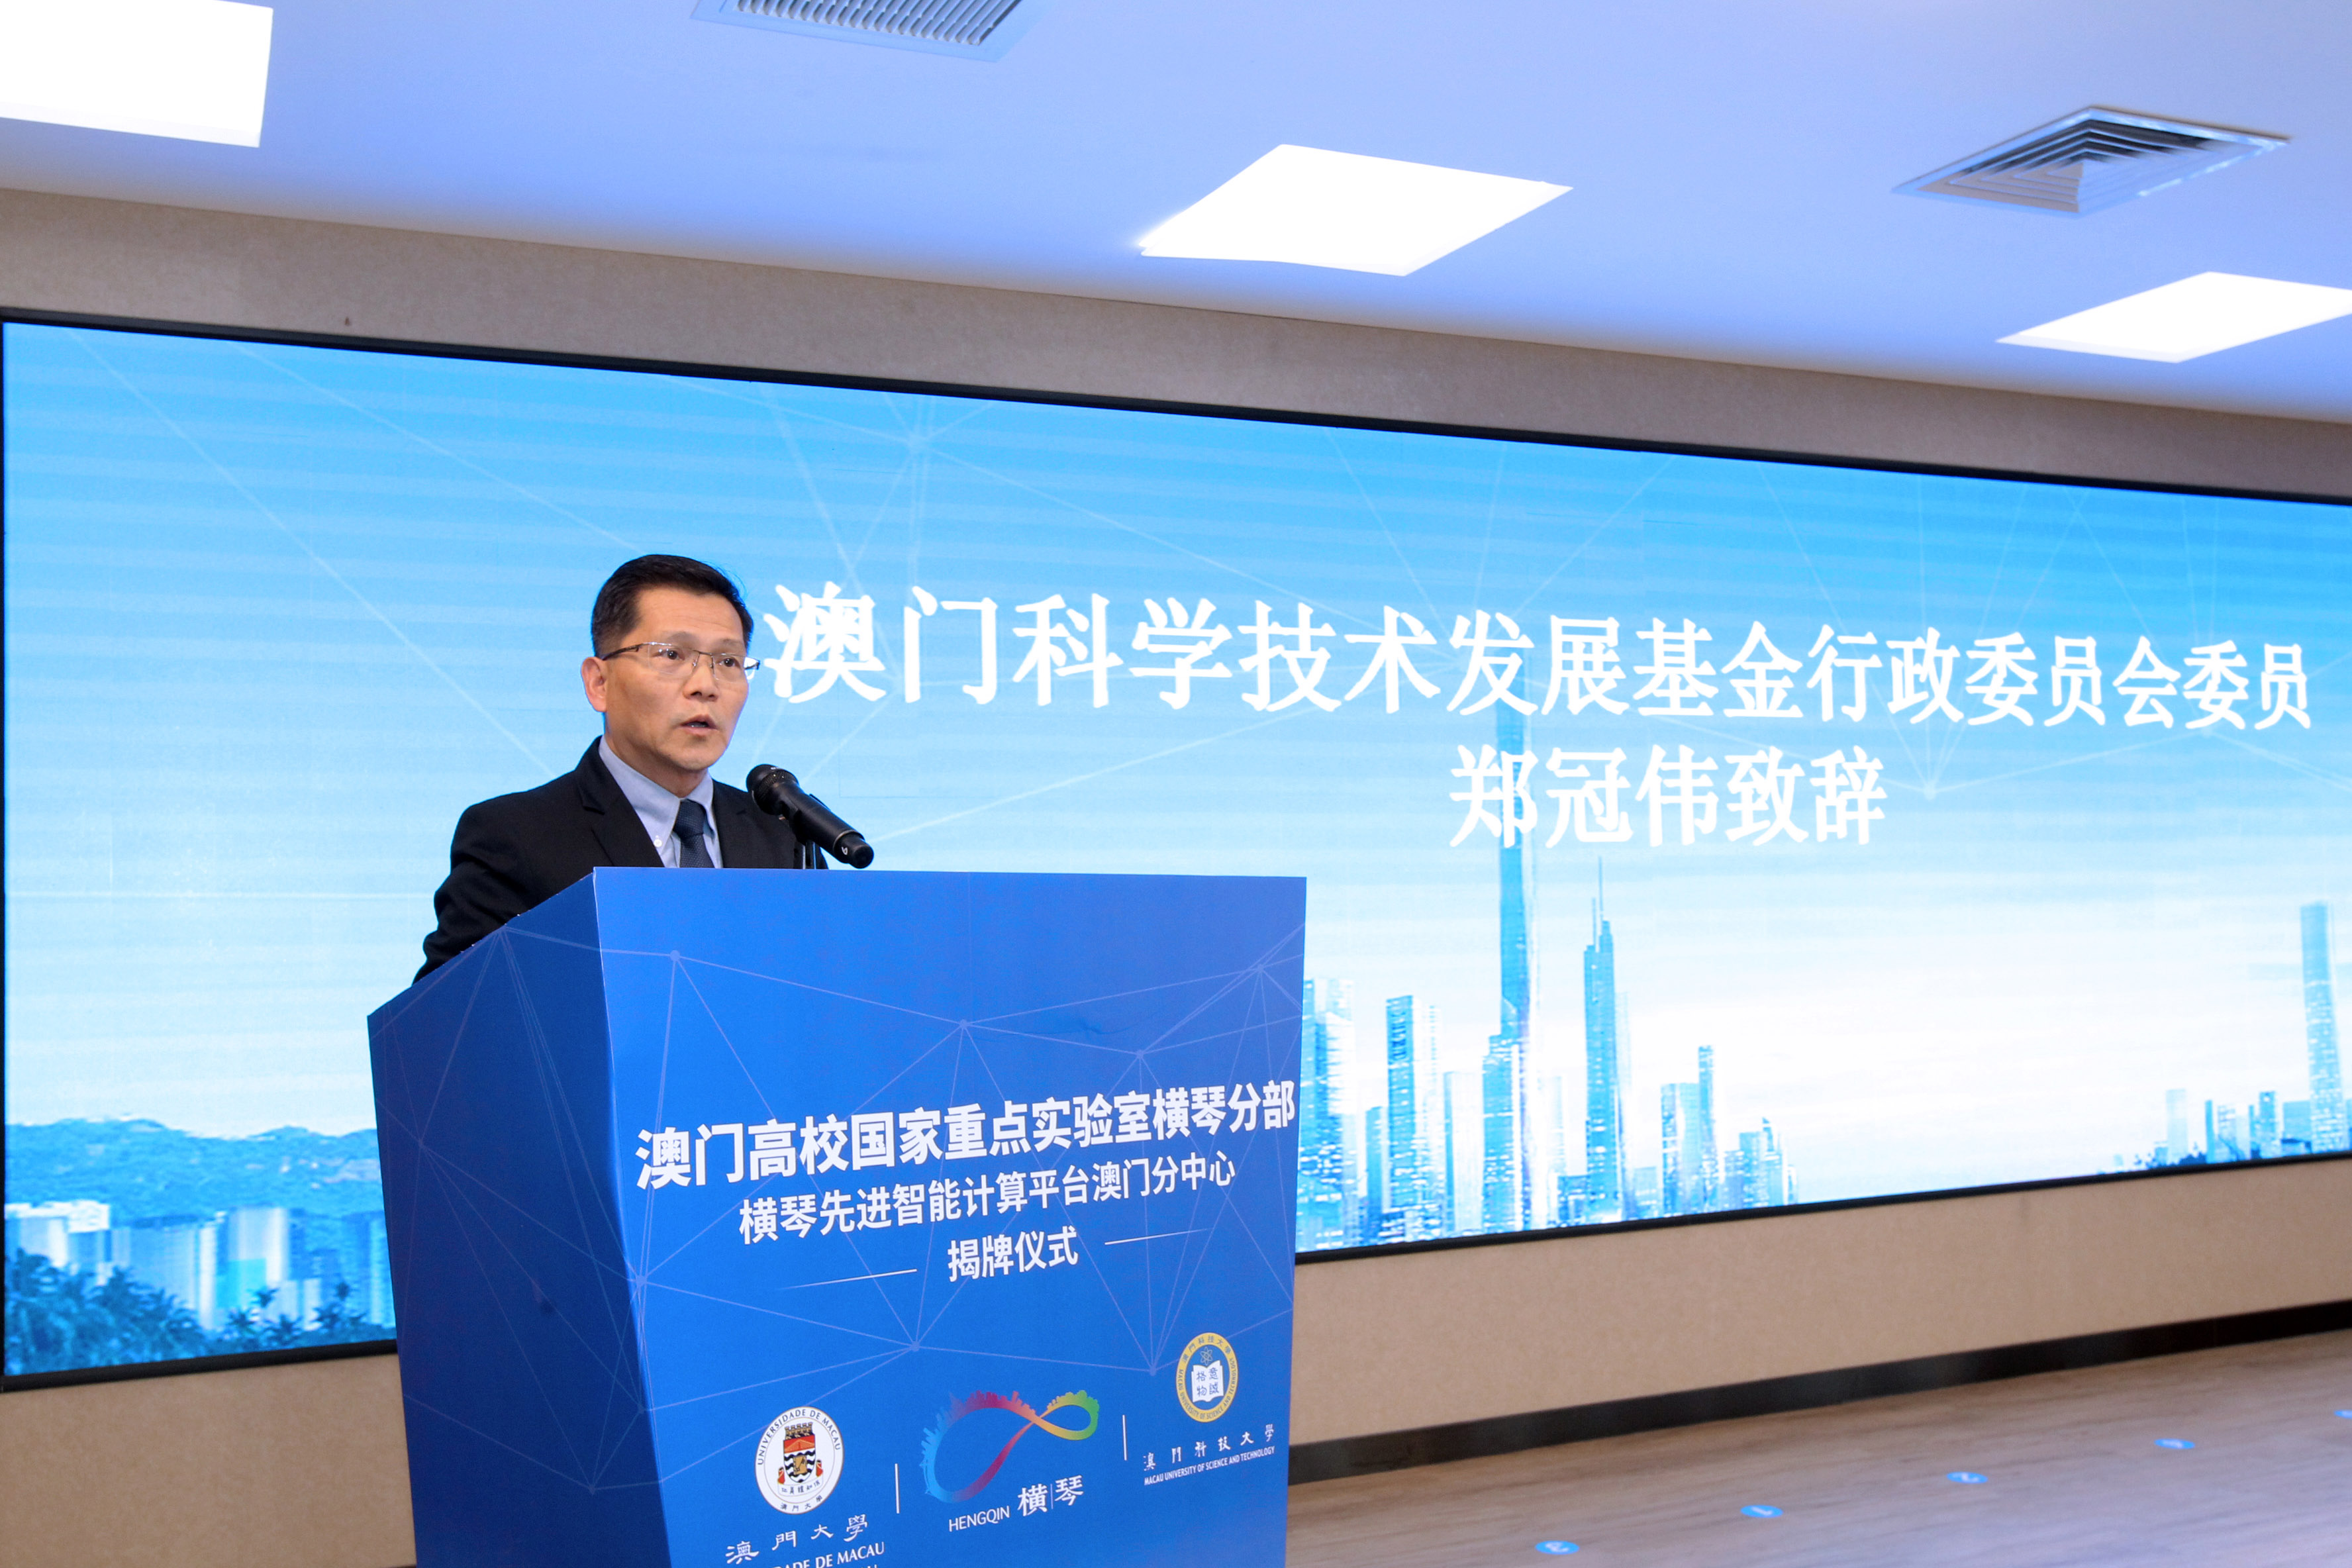 Cheang Kun Wai delivers a speech